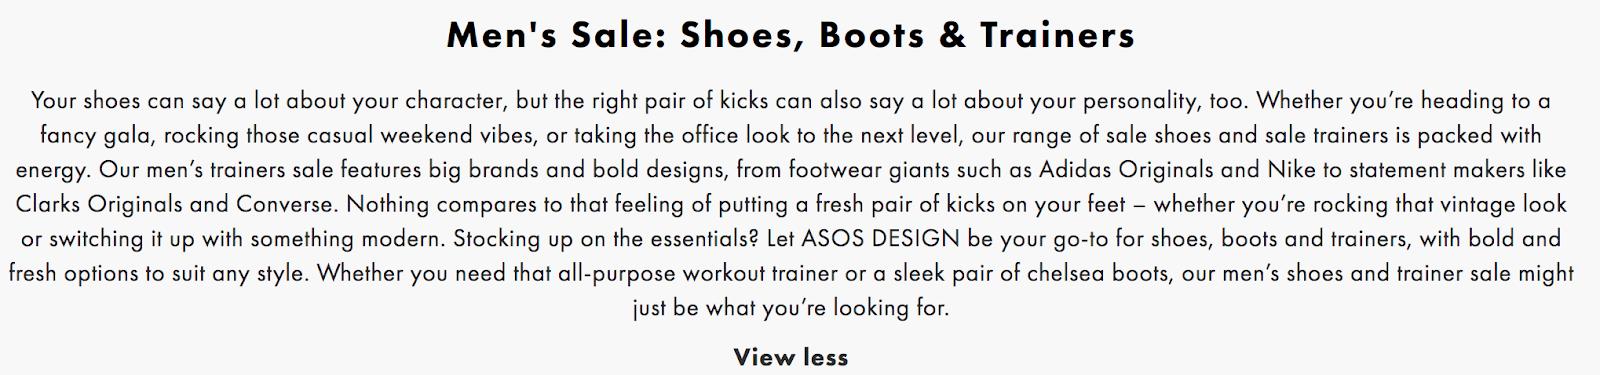 asos category description